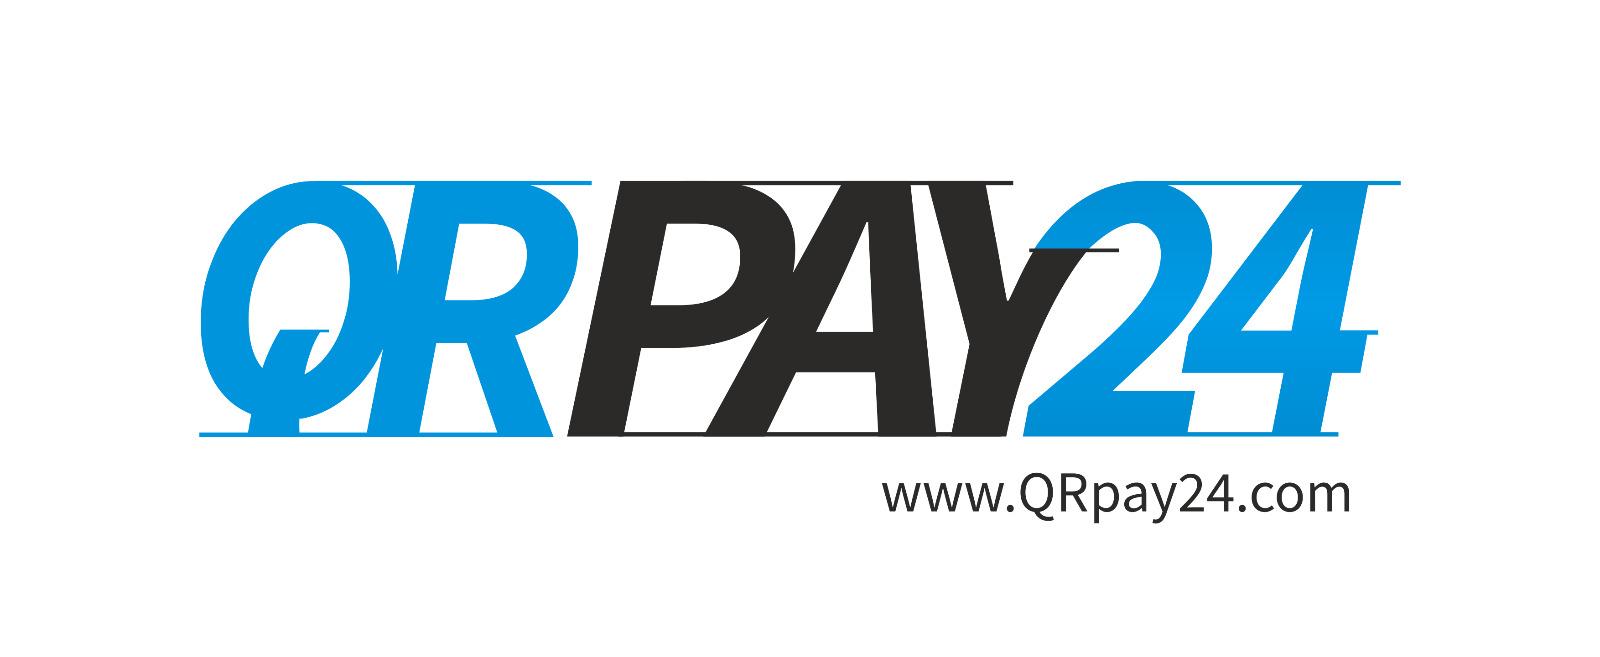 QRPay24 - Vor-Ort Online bezahlen